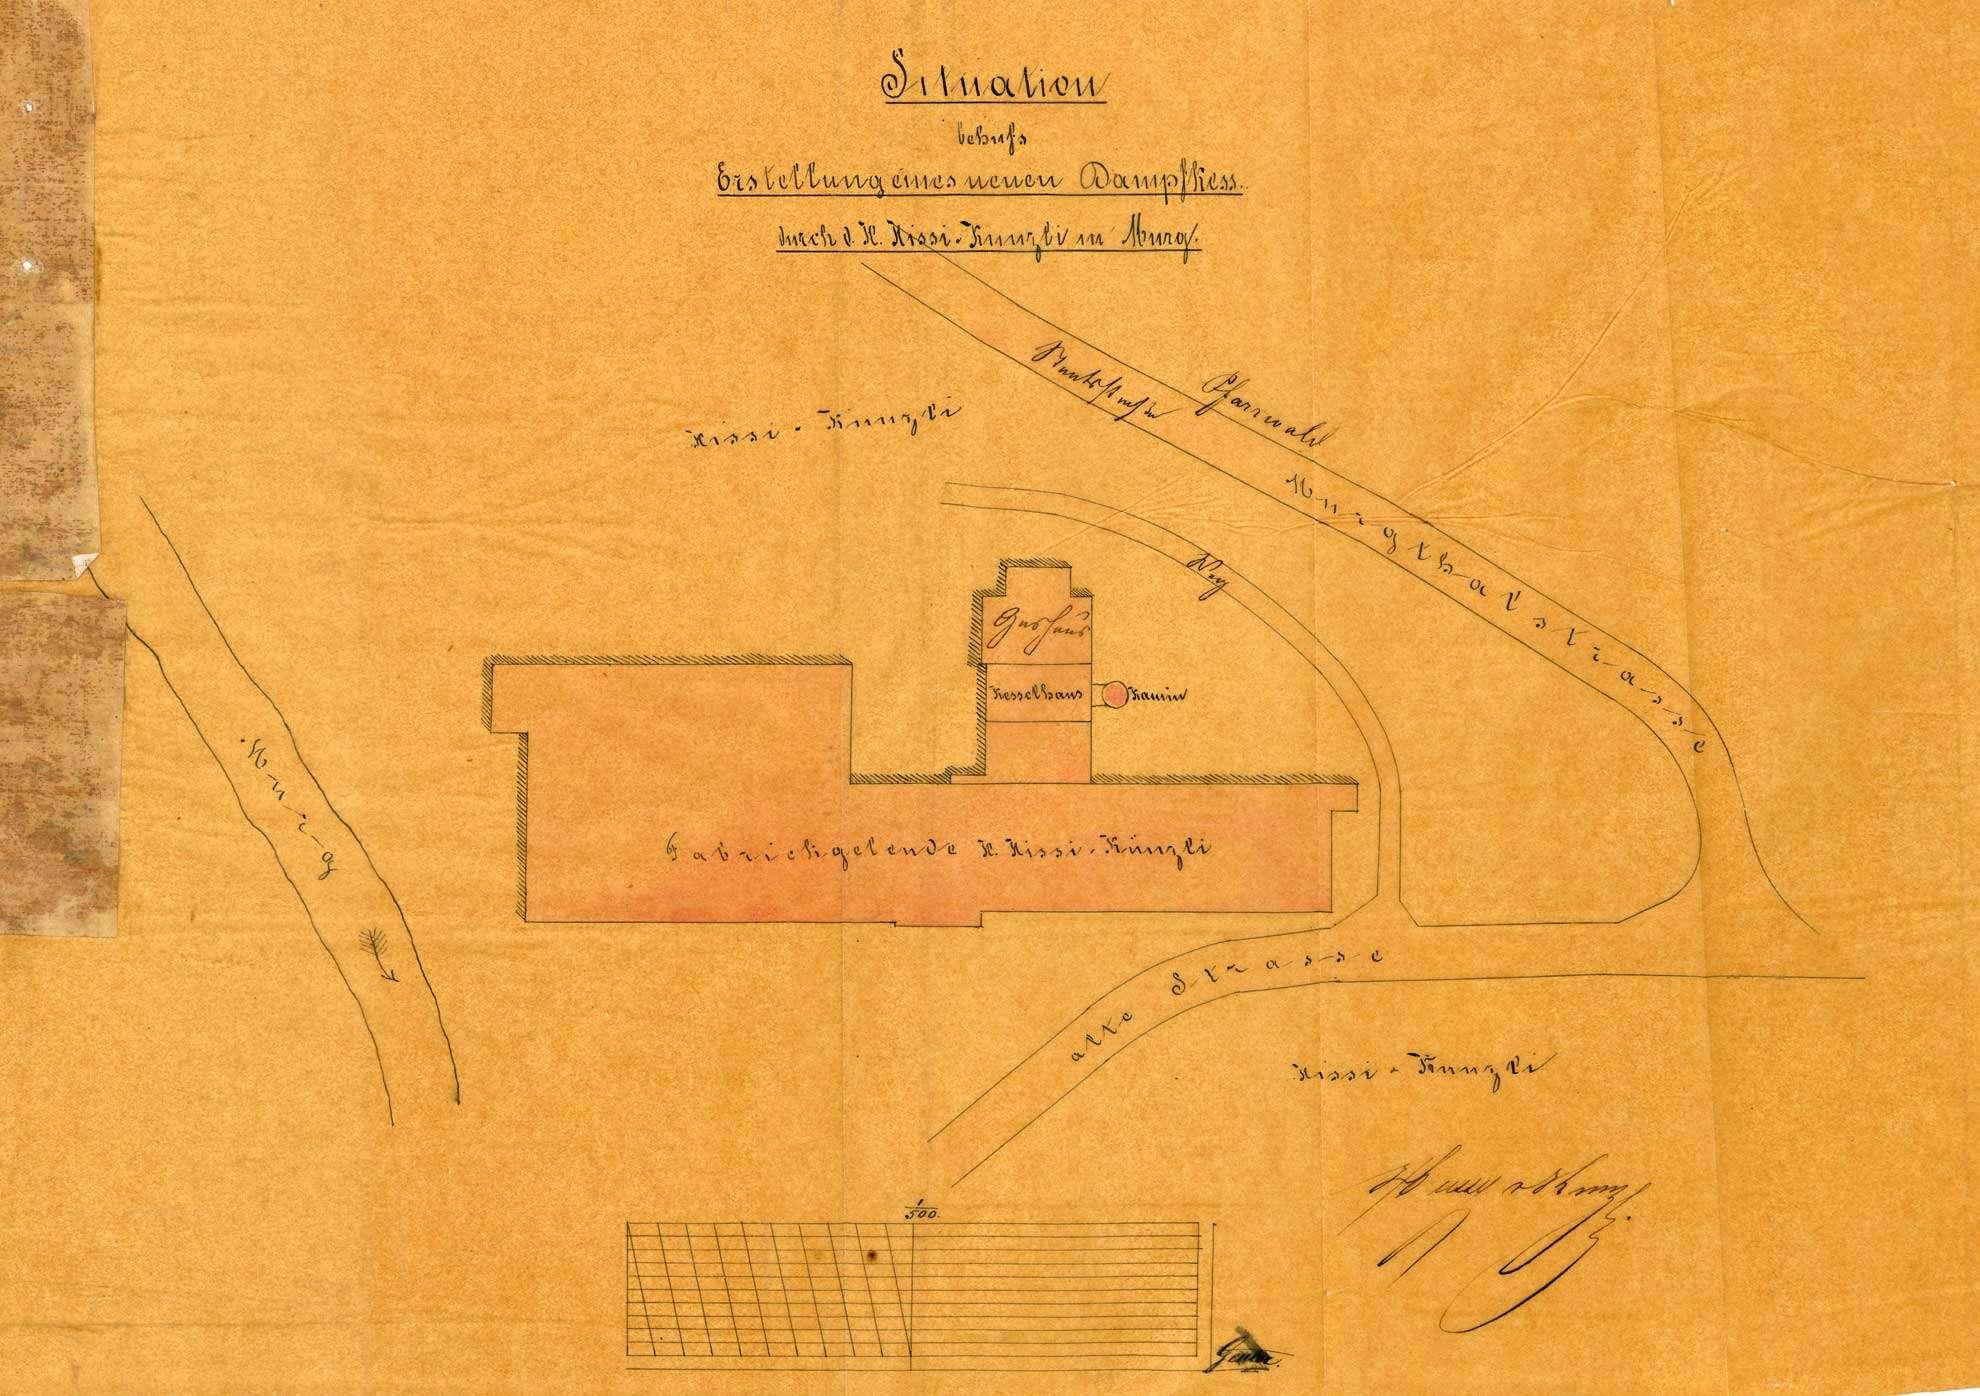 Dampfkessel der Firma Hüssy & Künzli in Murg, Bild 1